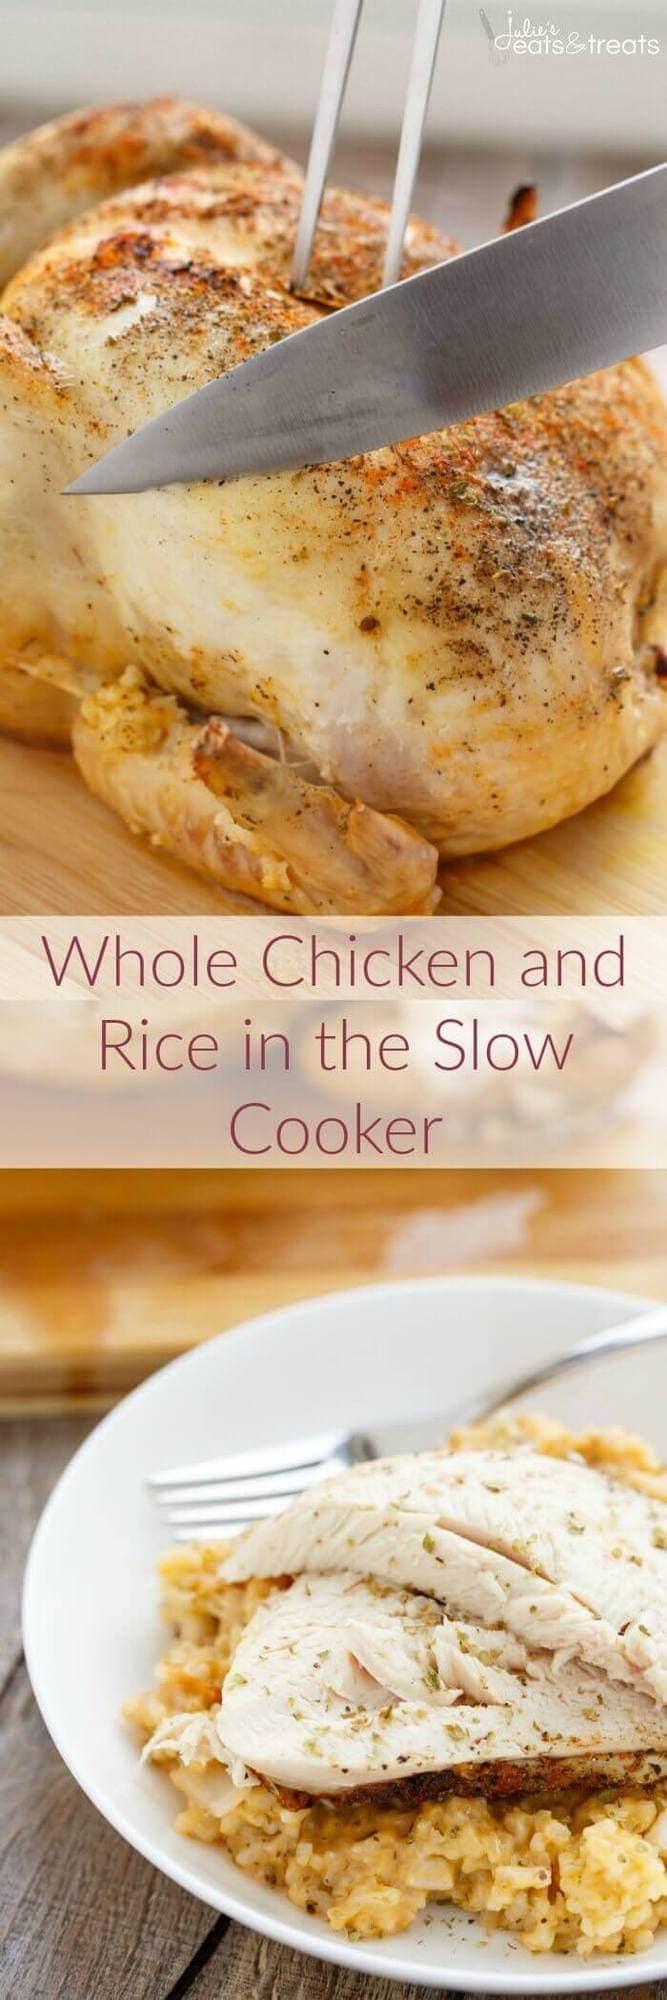 crock pot chicken and rice dinner julie 39 s eats treats. Black Bedroom Furniture Sets. Home Design Ideas